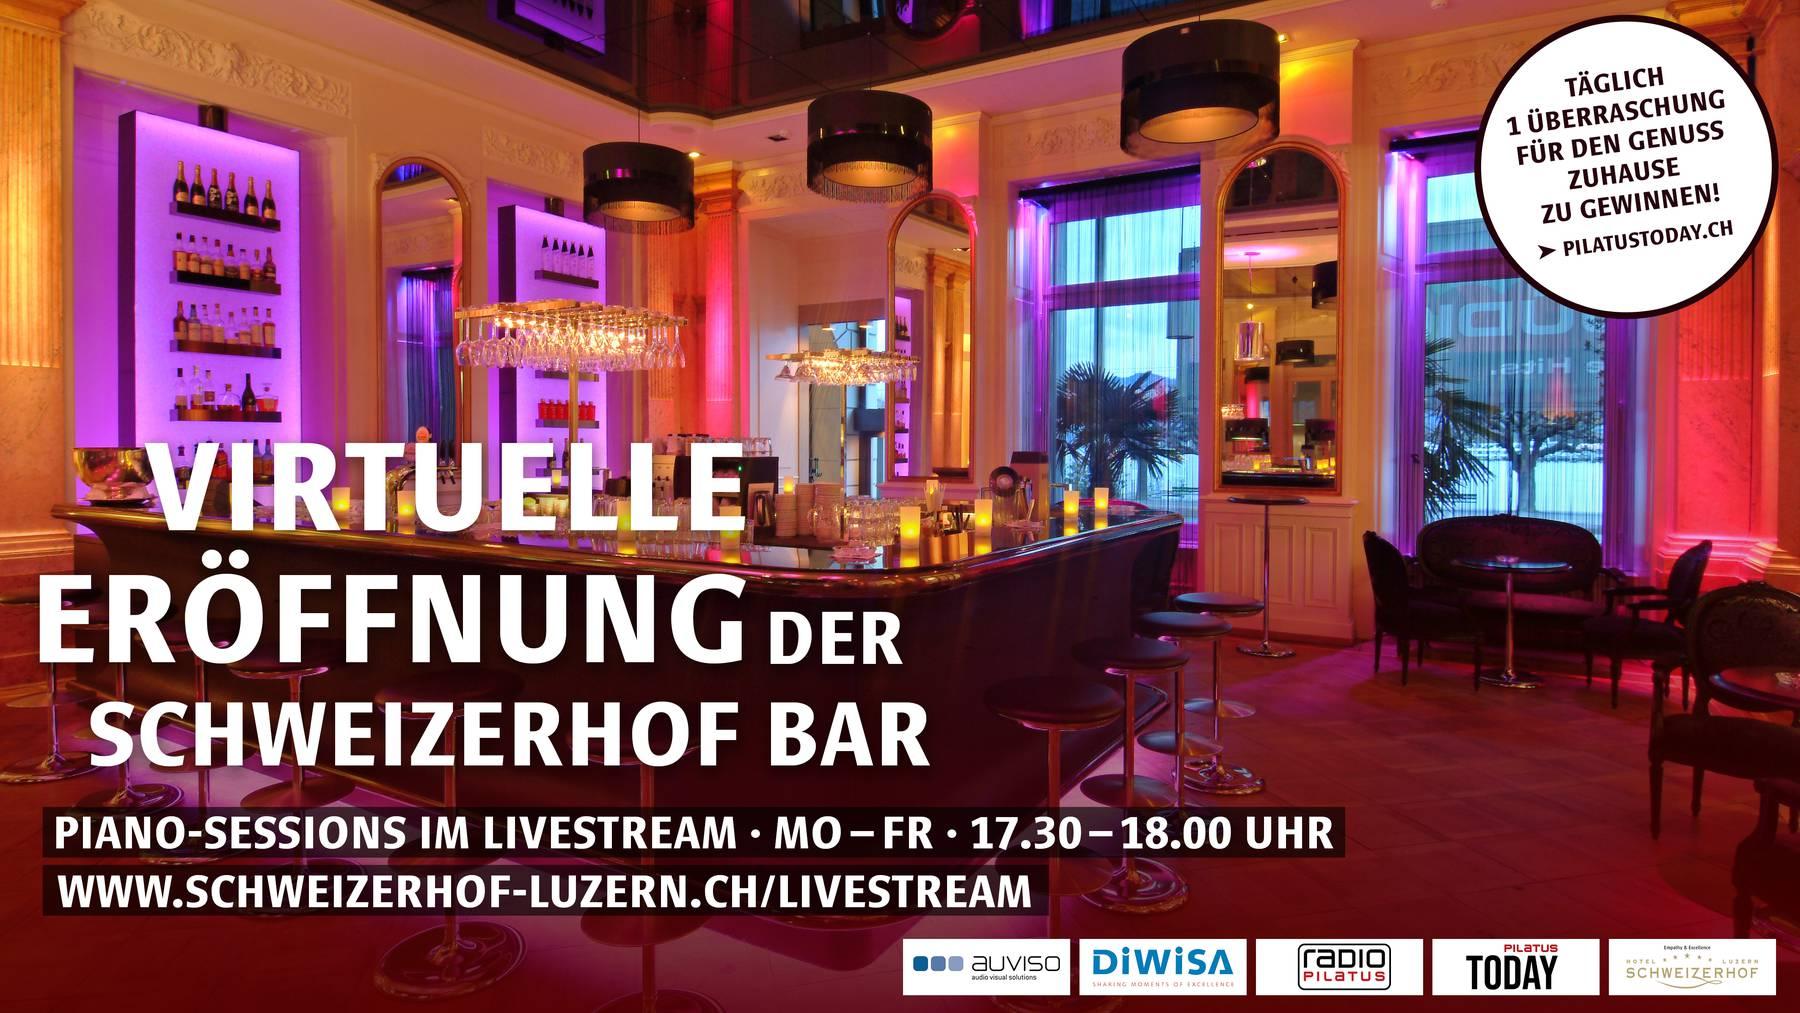 Schweizerhof Luzern Live-Stream Apéro